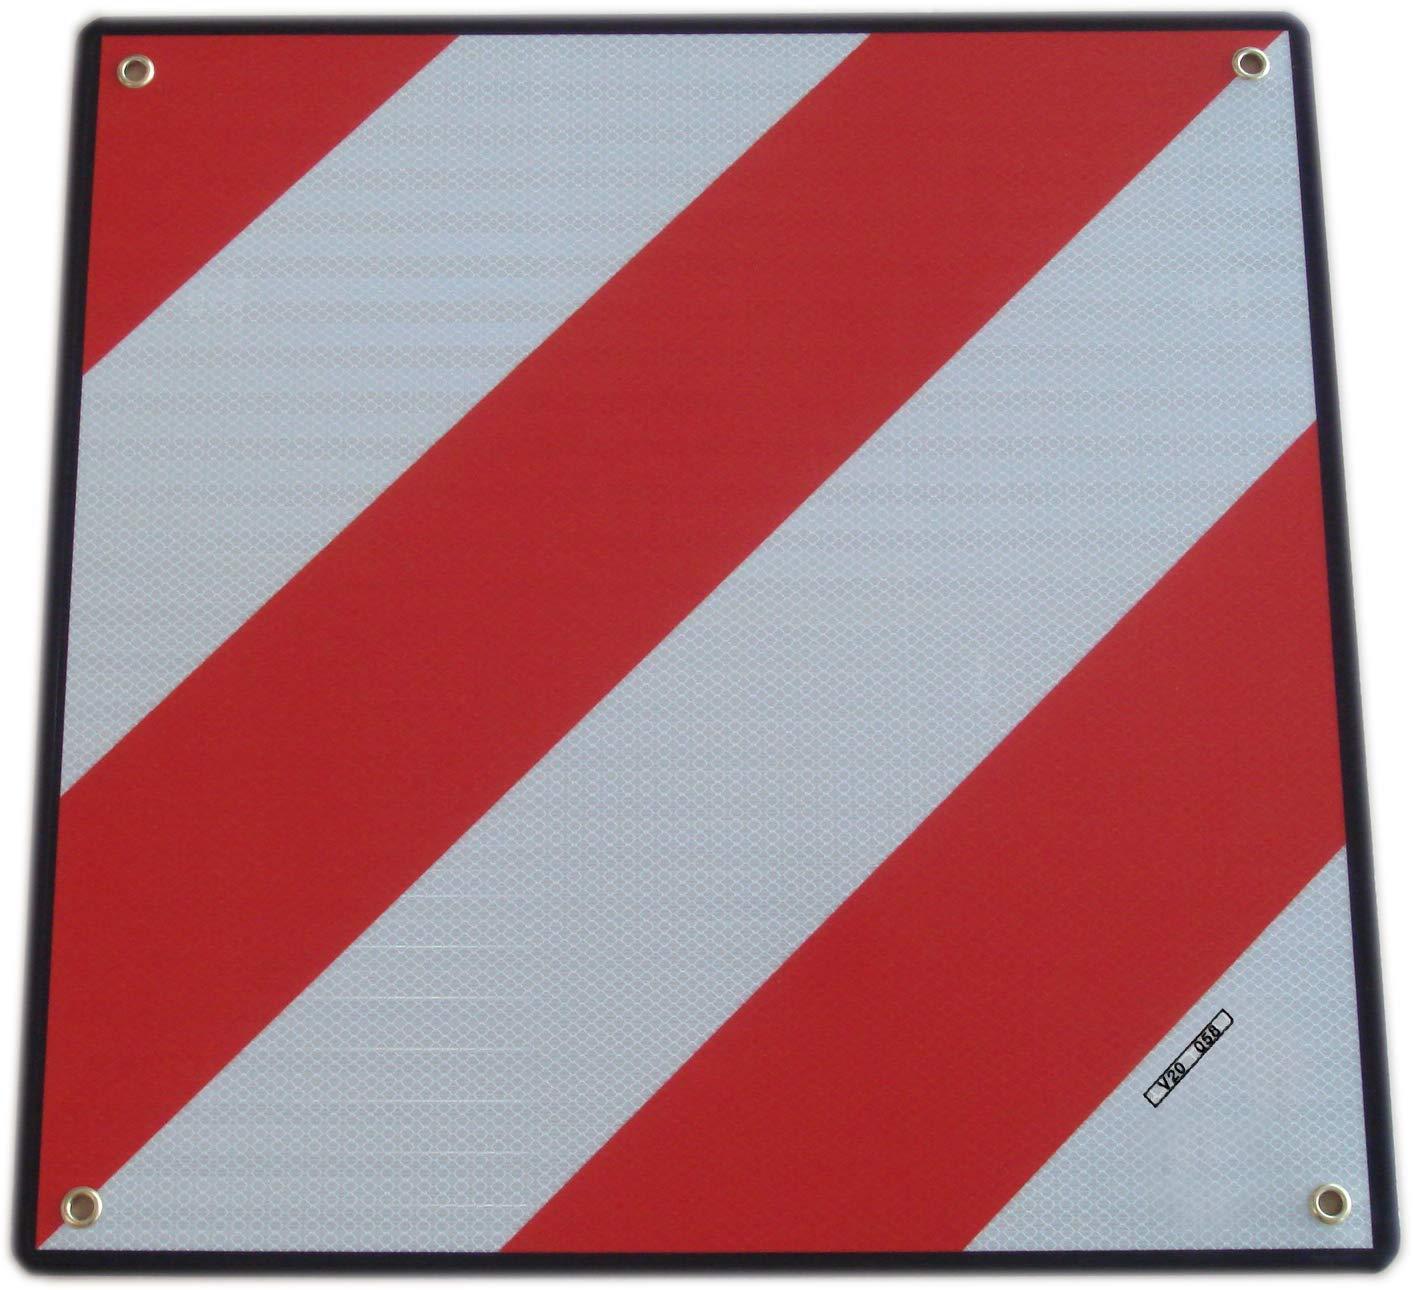 bottari-v20-placa-v20-carga-sobresaliente-50x50